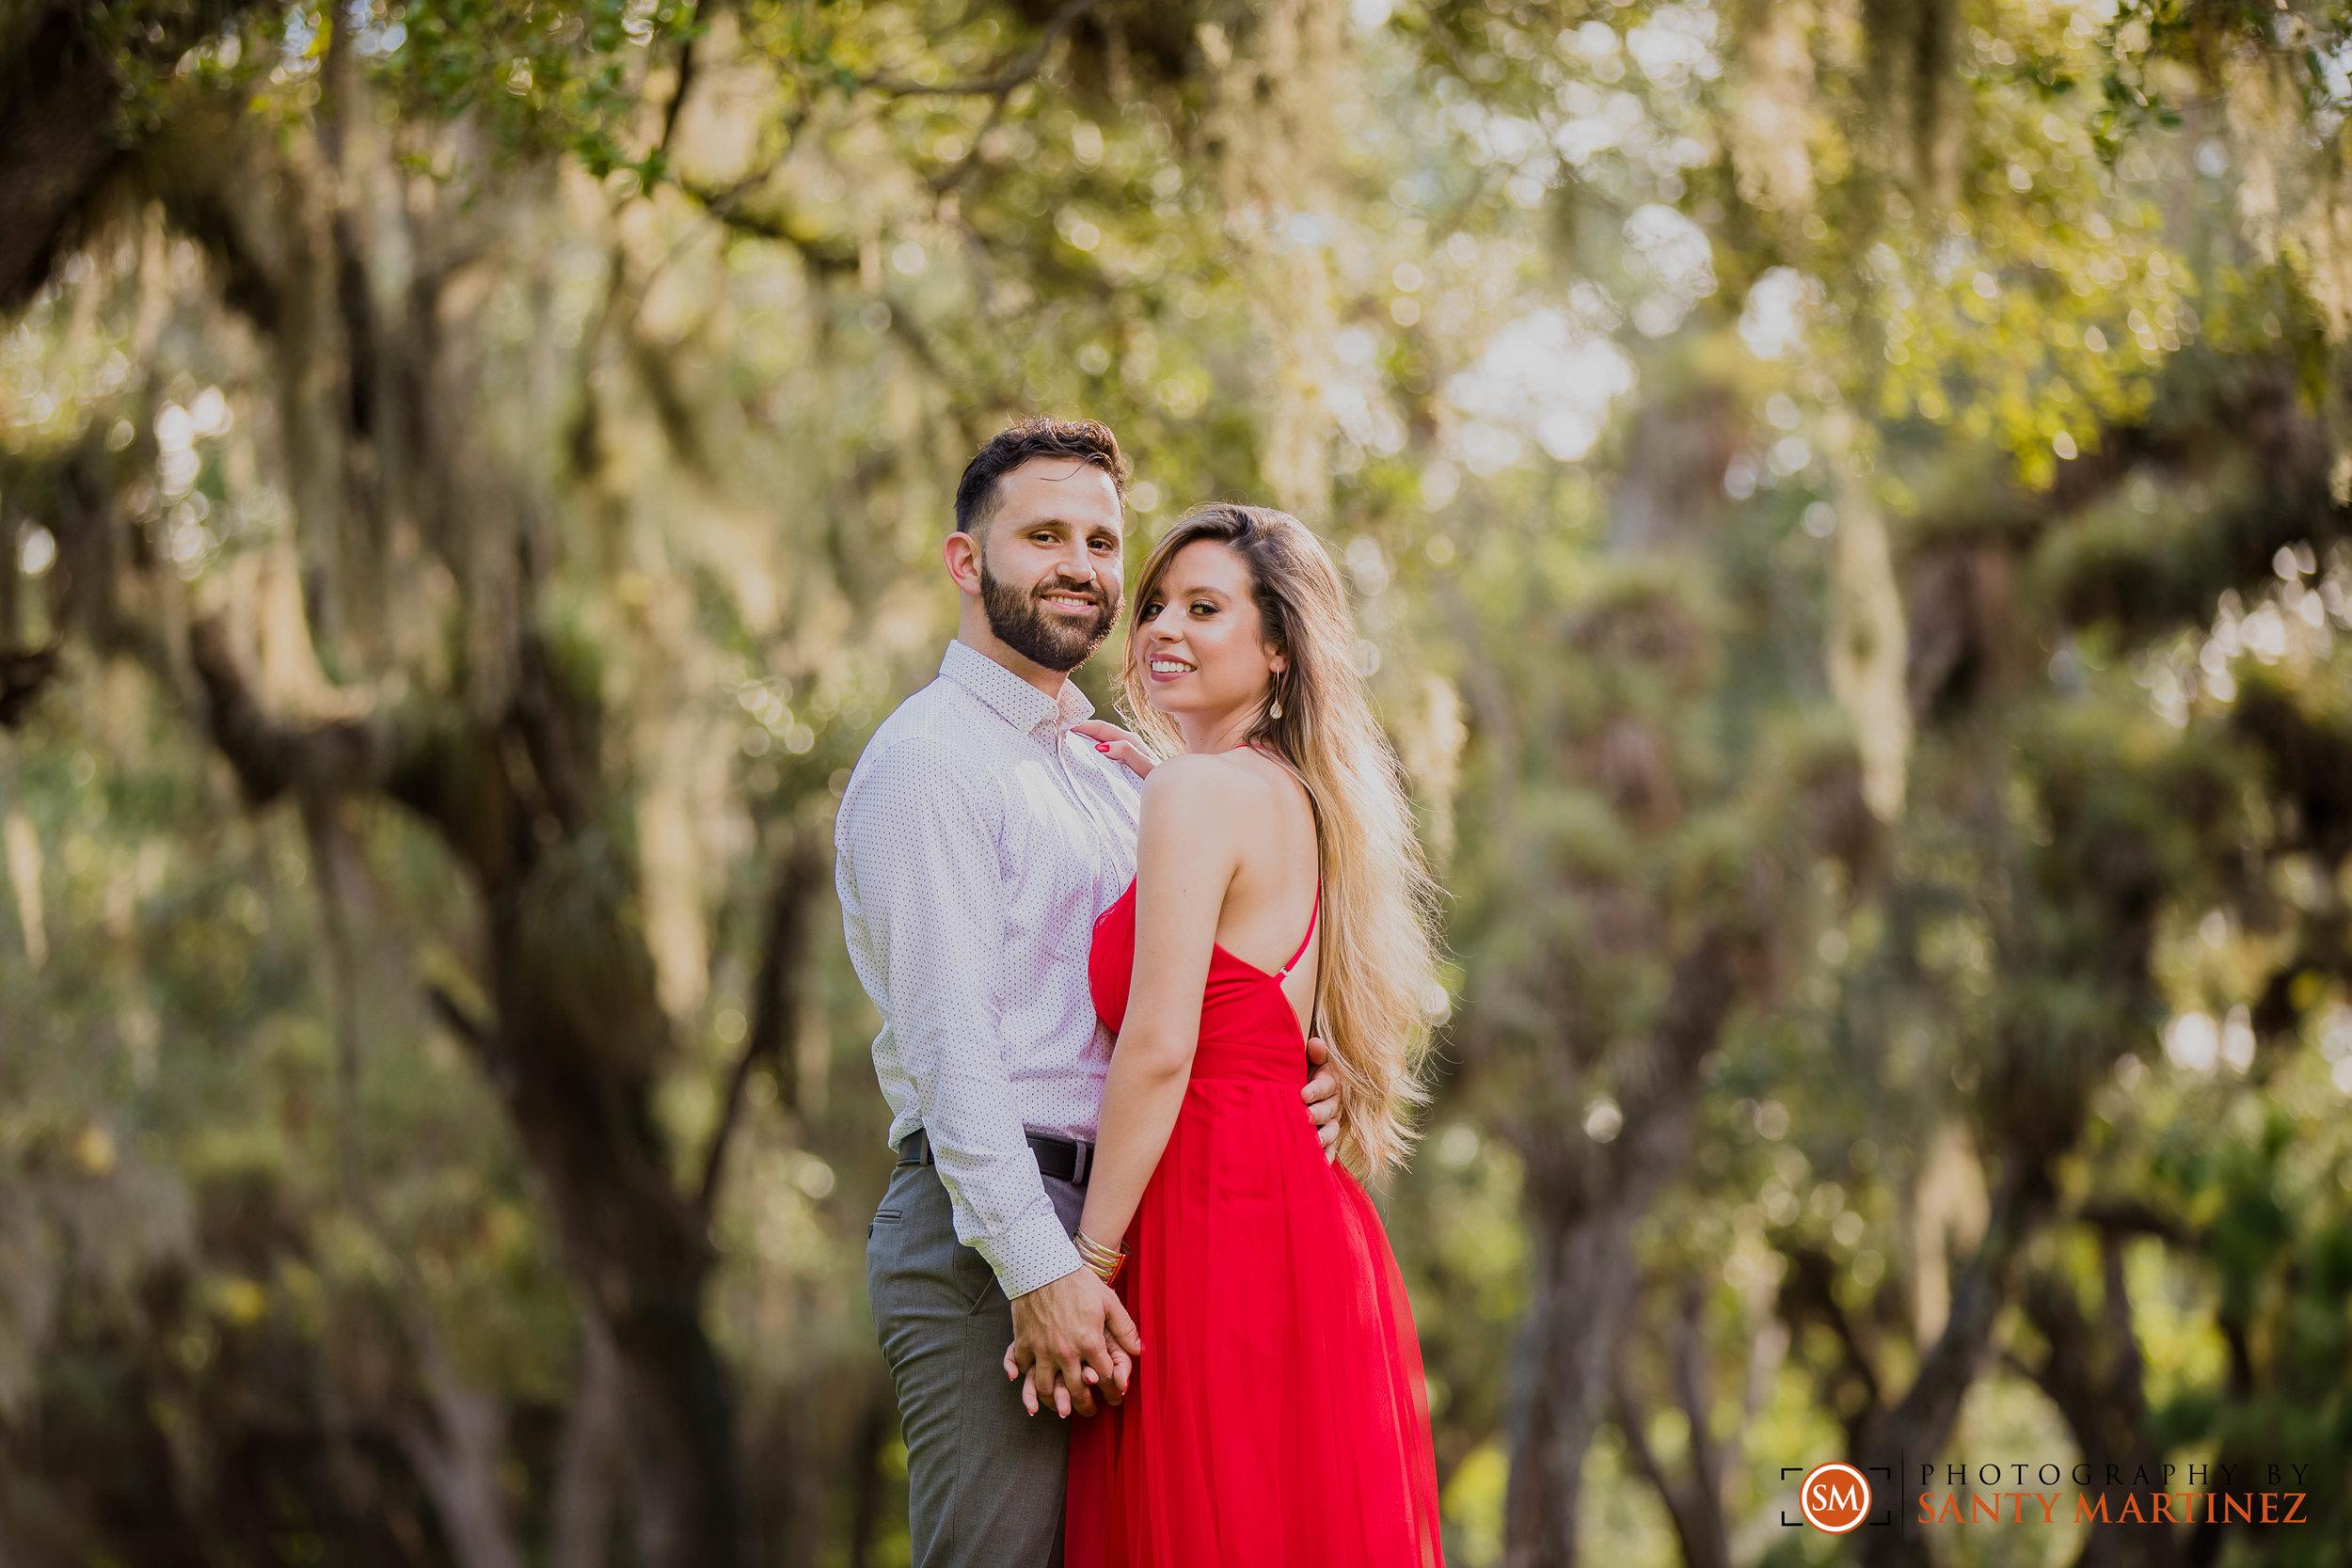 Engagement Session - Matheson Hammock Park - Santy Martinez Wedding Photographer-9.jpg